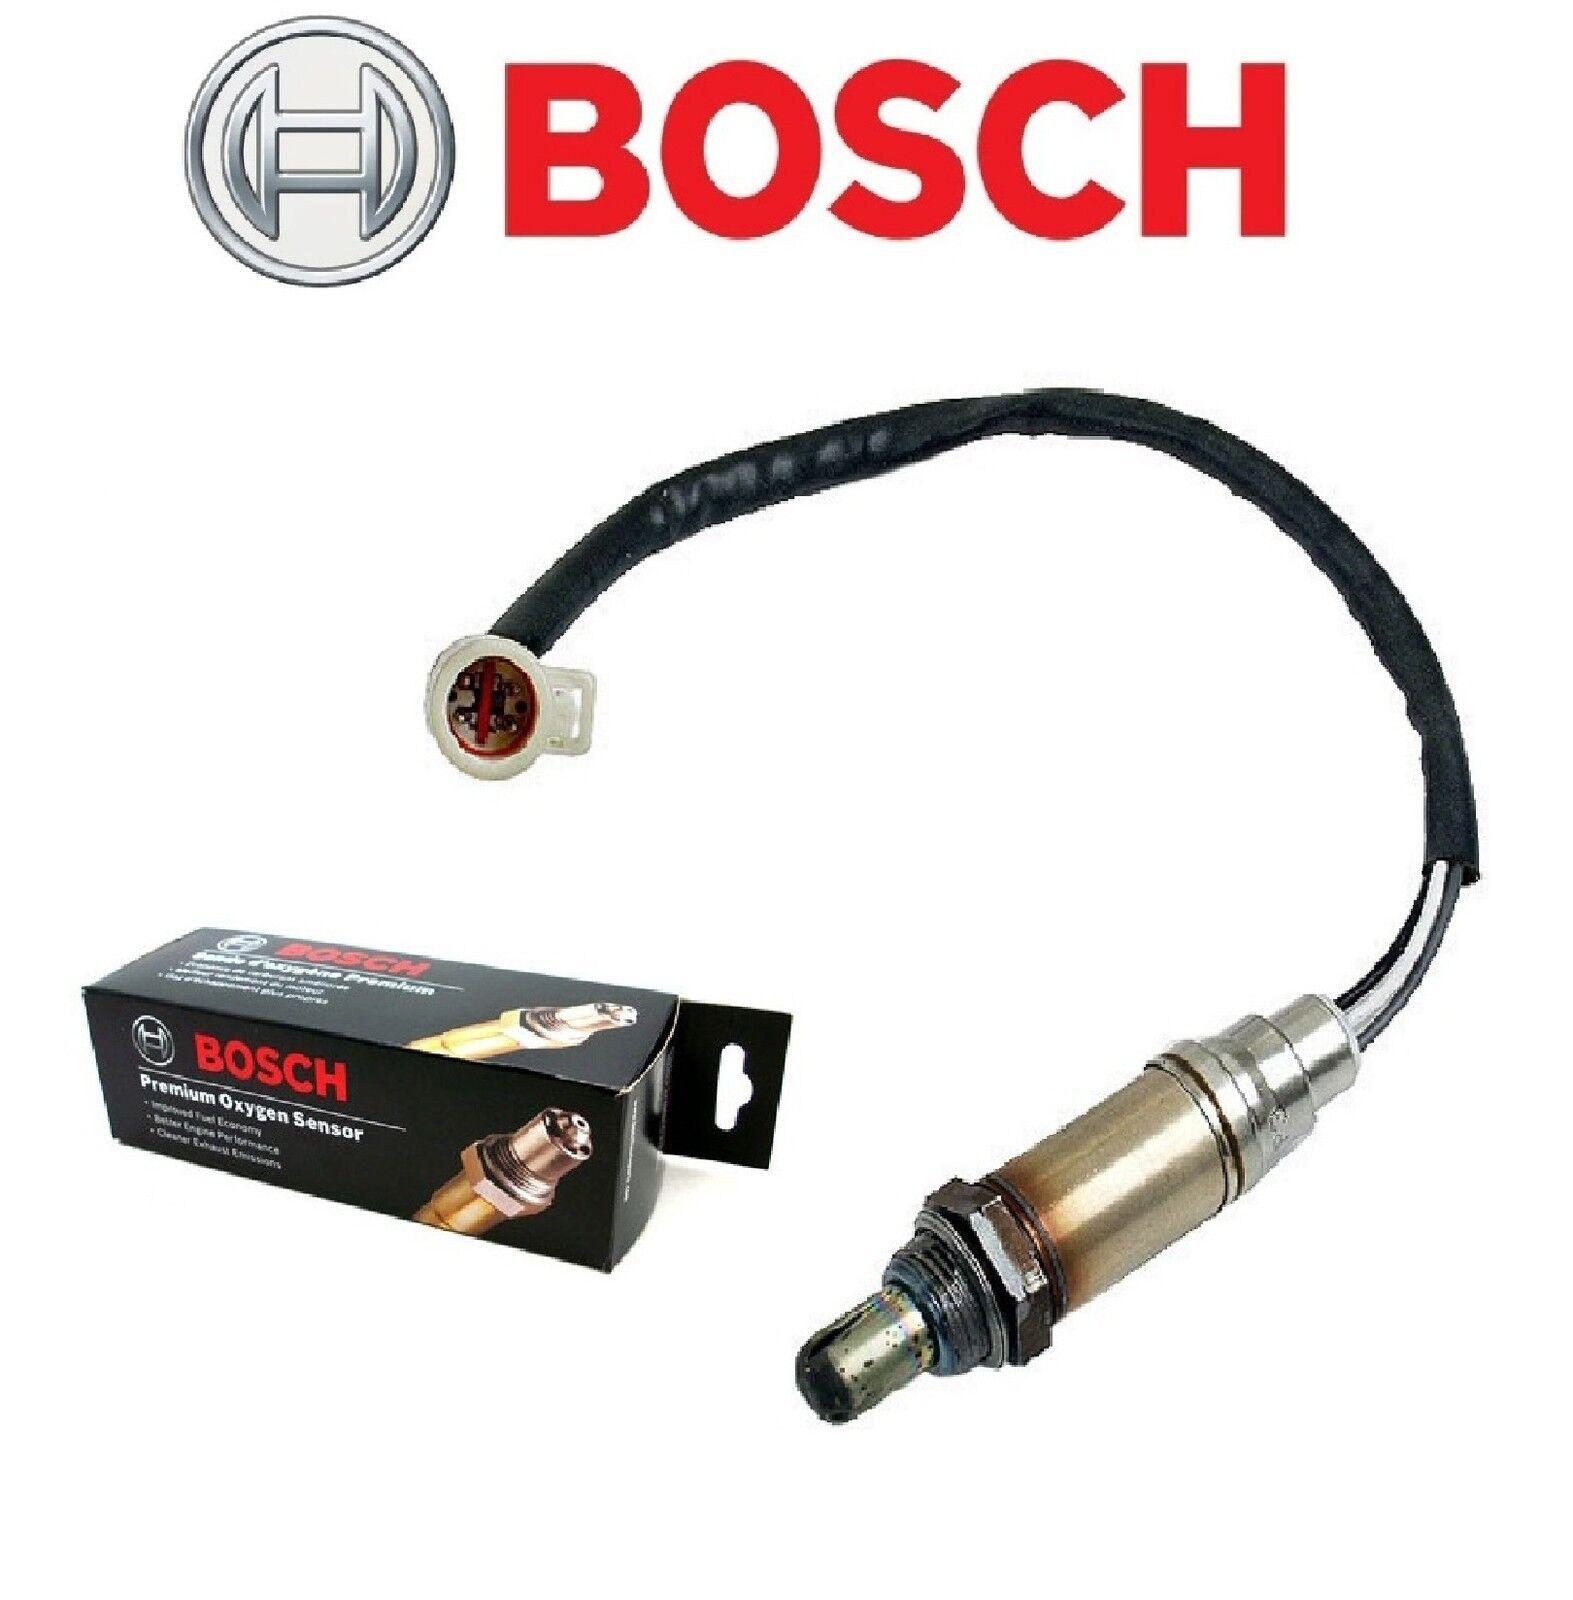 Bosch OE Oxygen Sensor Upstream for 2007-2010 FORD ESCAPE V6-3.0L engine